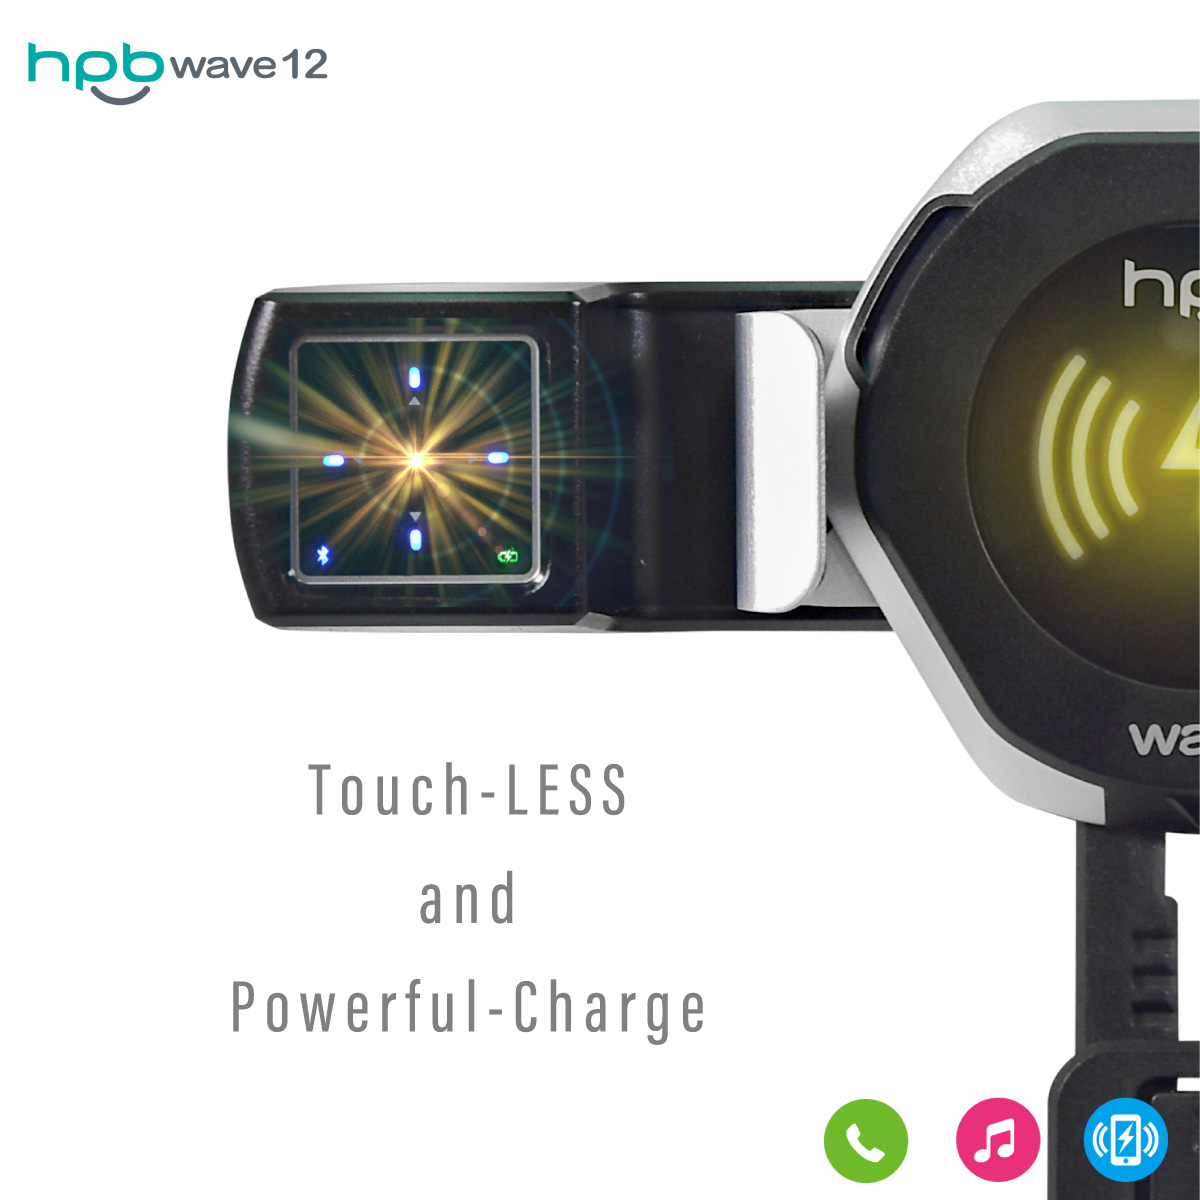 HPB Hi-Tech Corp hpb wave12 Bluetooth接続 スマホ ワイヤレス ジェスチャーコントローラー ジェスチャー操作 ワイヤレス充電器 qi チー スマートフォン 急速 車載用 | 車載充電器 iphone アンドロイド 車載ホルダー エアコン吹出し口 _84139